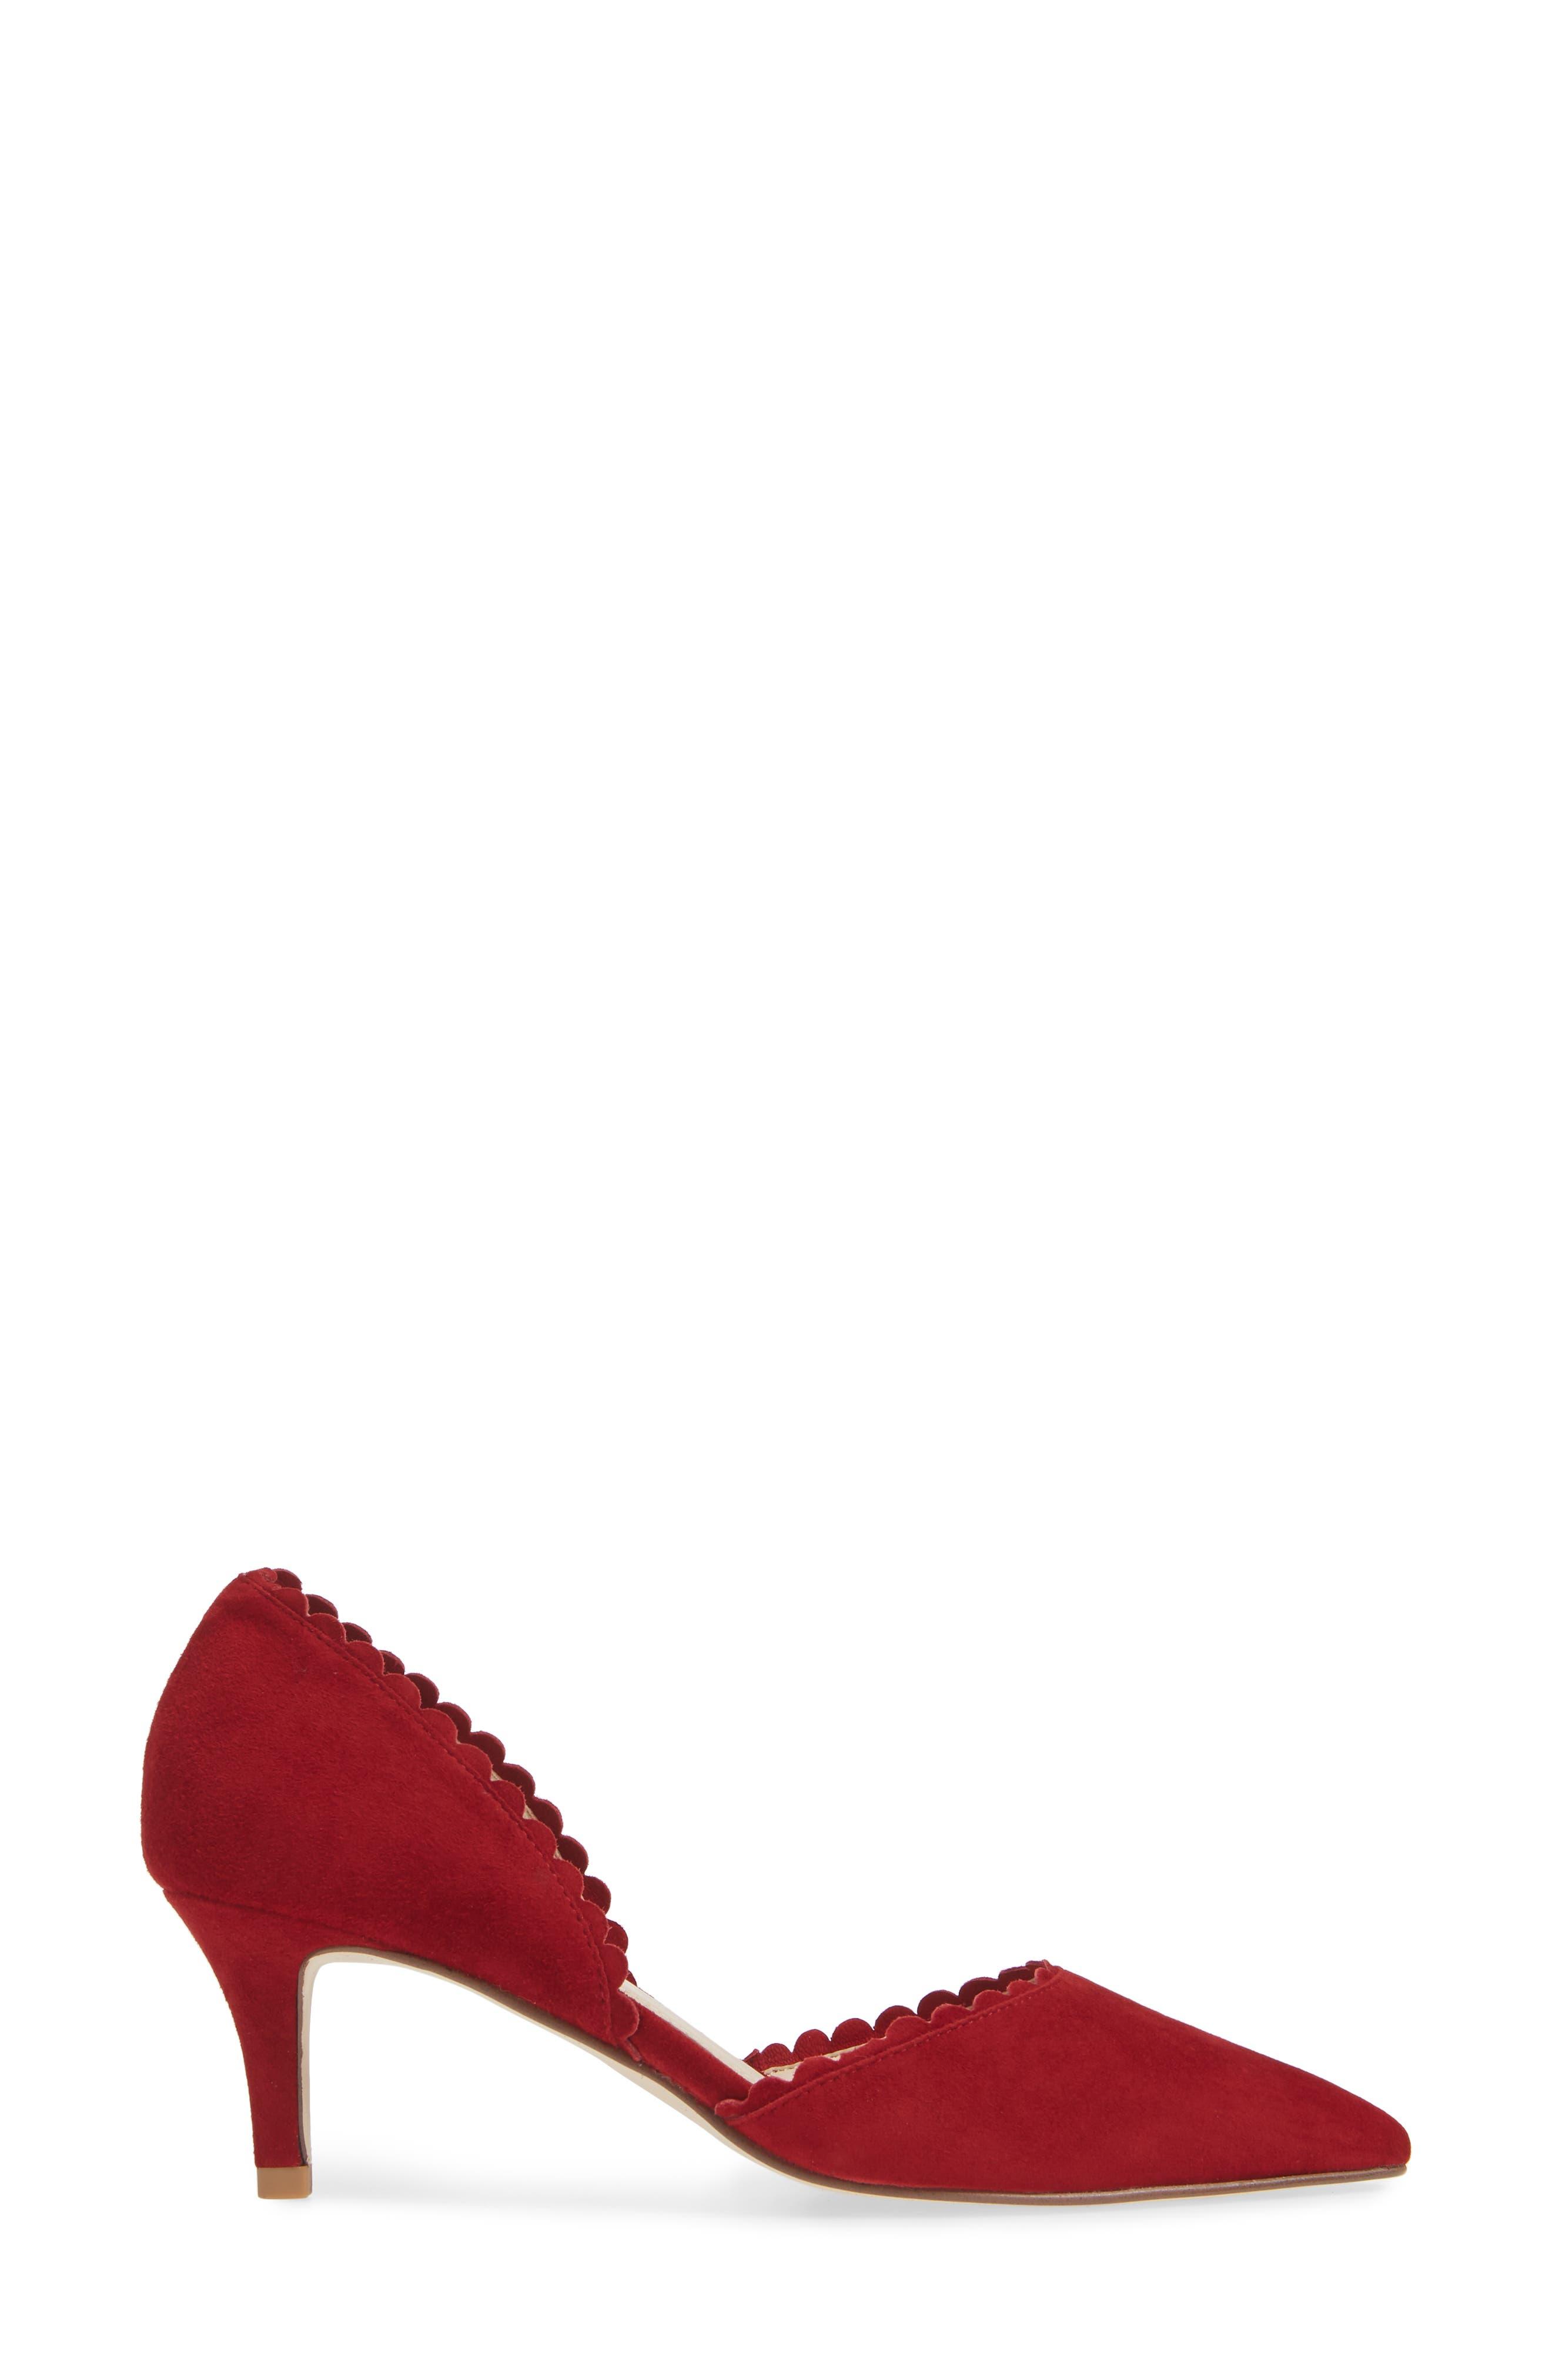 Kenny d'Orsay Pump,                             Alternate thumbnail 3, color,                             SCARLET SUEDE